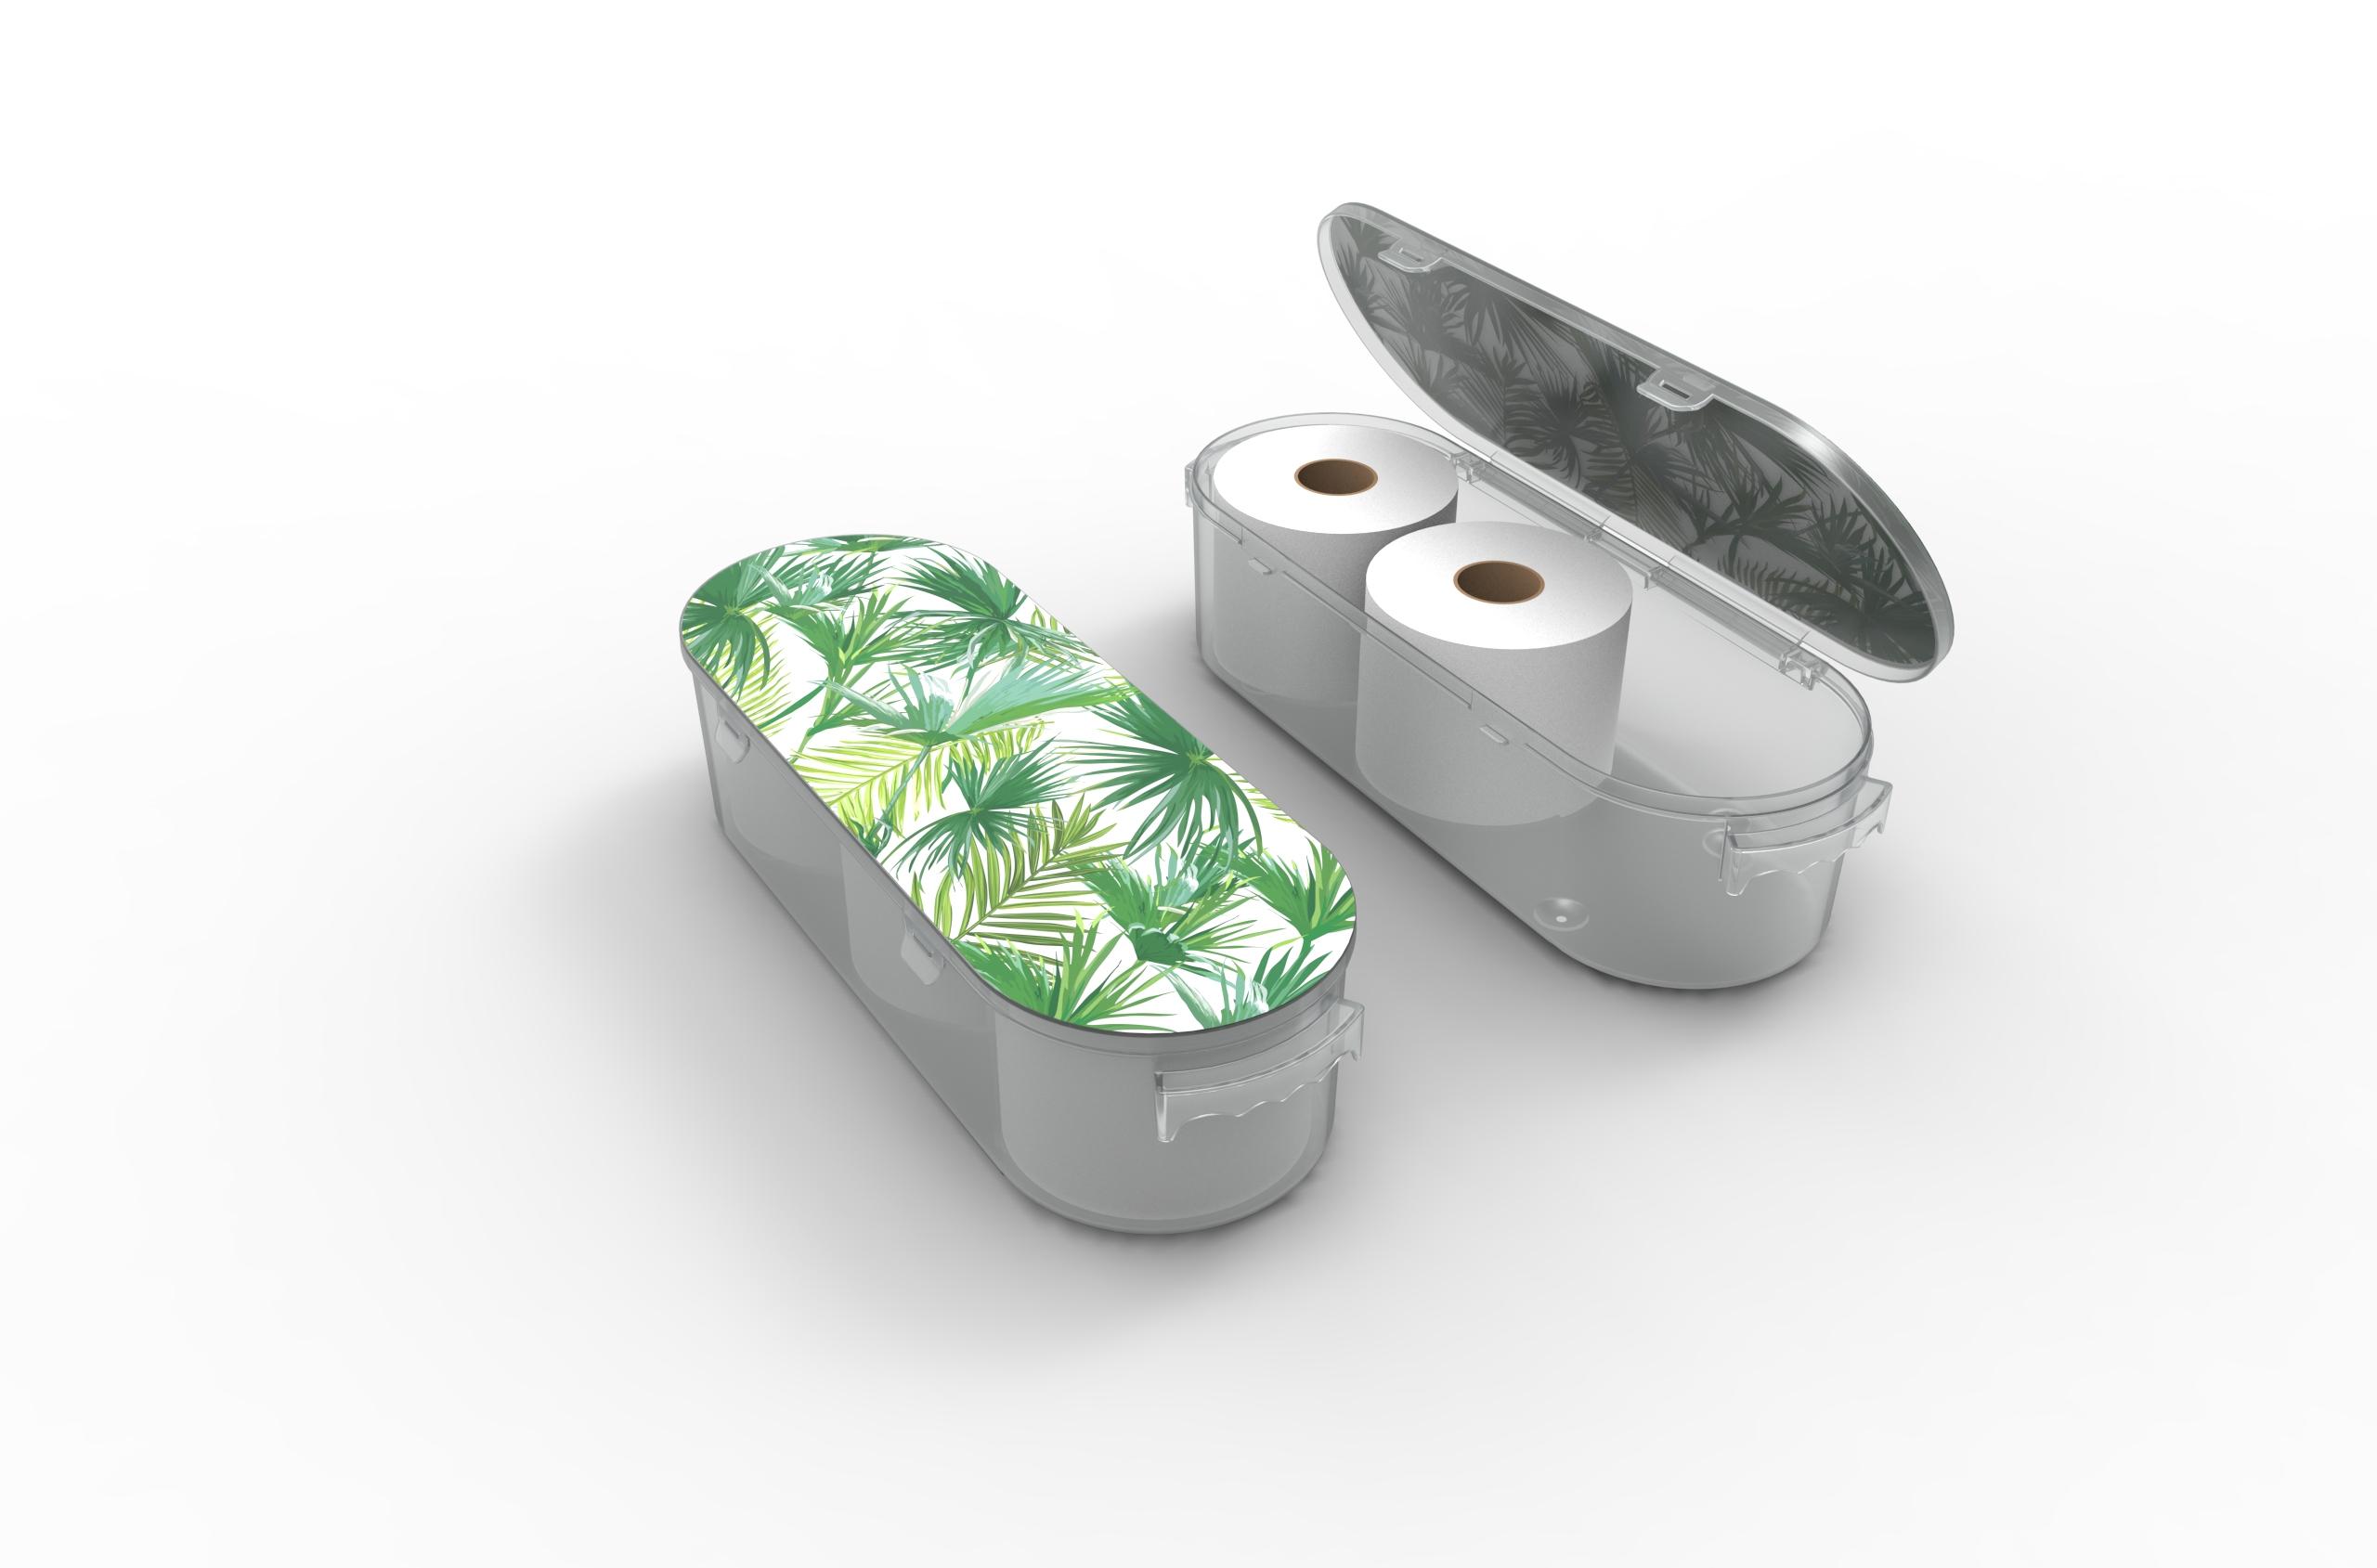 Nykia Designs Bathroom Toilet Paper Storage Solution - Palm Leaves